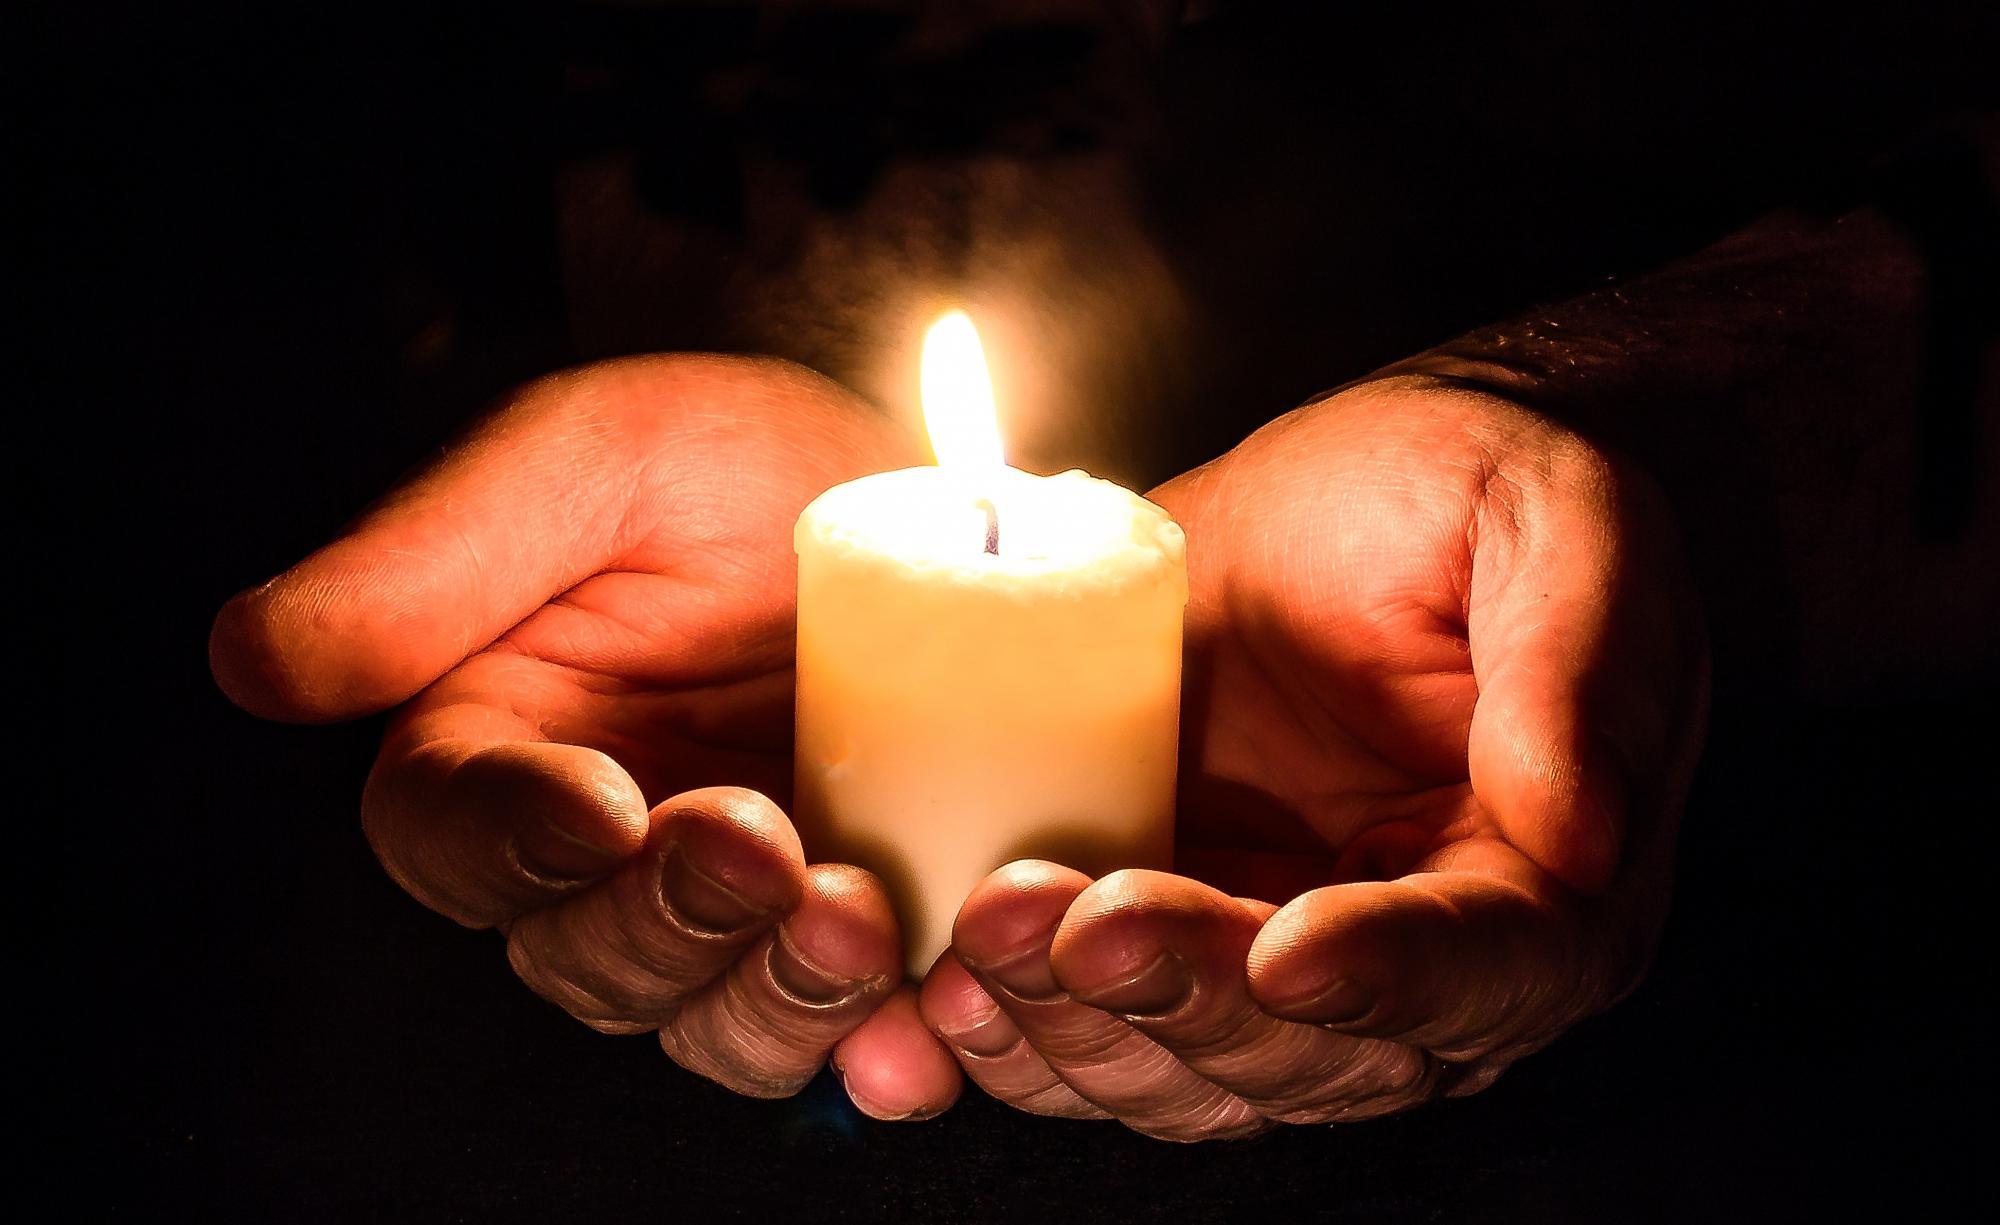 Gebed gevraagd - Coronacrisis